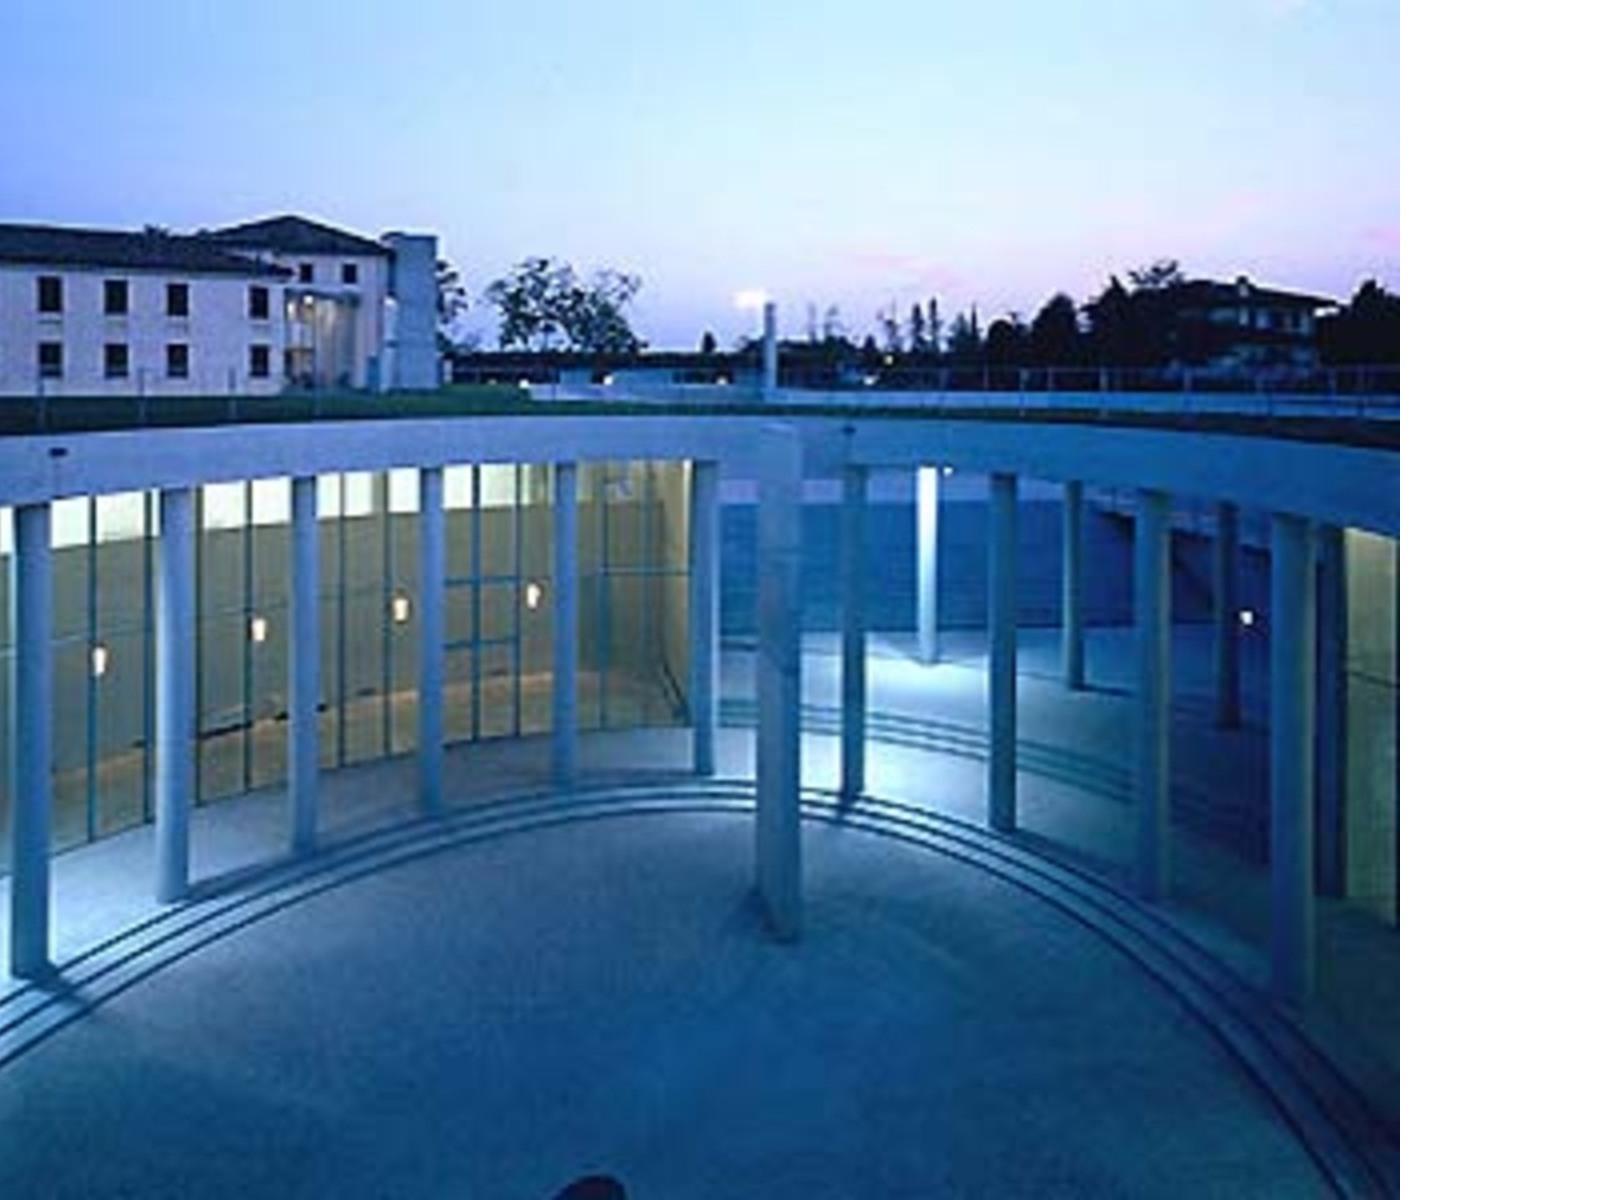 Fabrica pour benetton a trevise tadao ando floornature for Benetton vilamarina